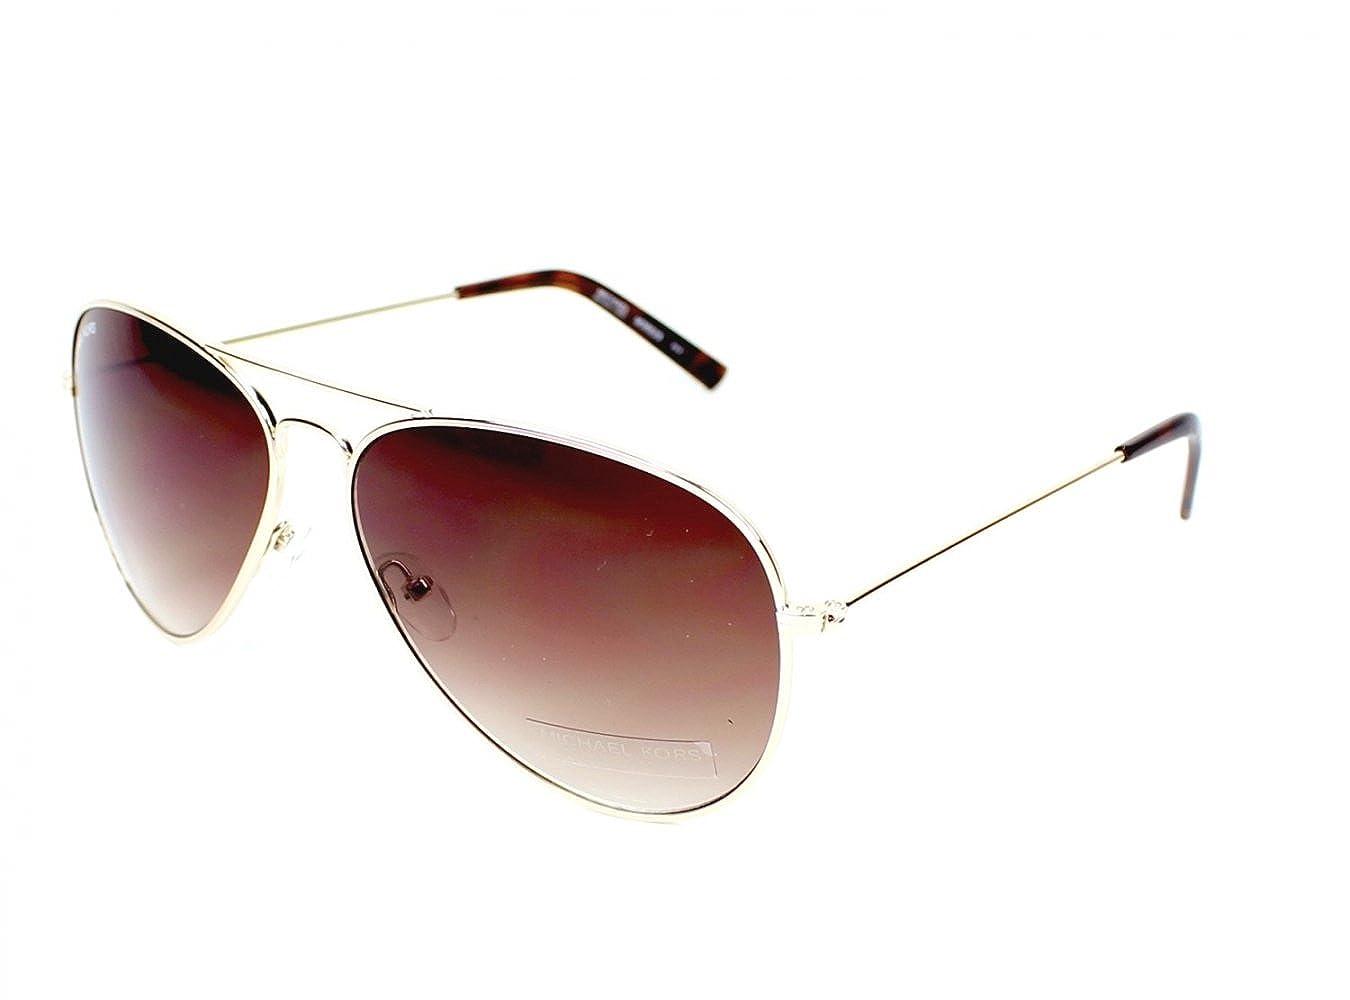 0f8fa8b87be4 Michael Kors sunglasses M 3002 S 717 Metal Gold Brown Gradient:  Amazon.co.uk: Clothing